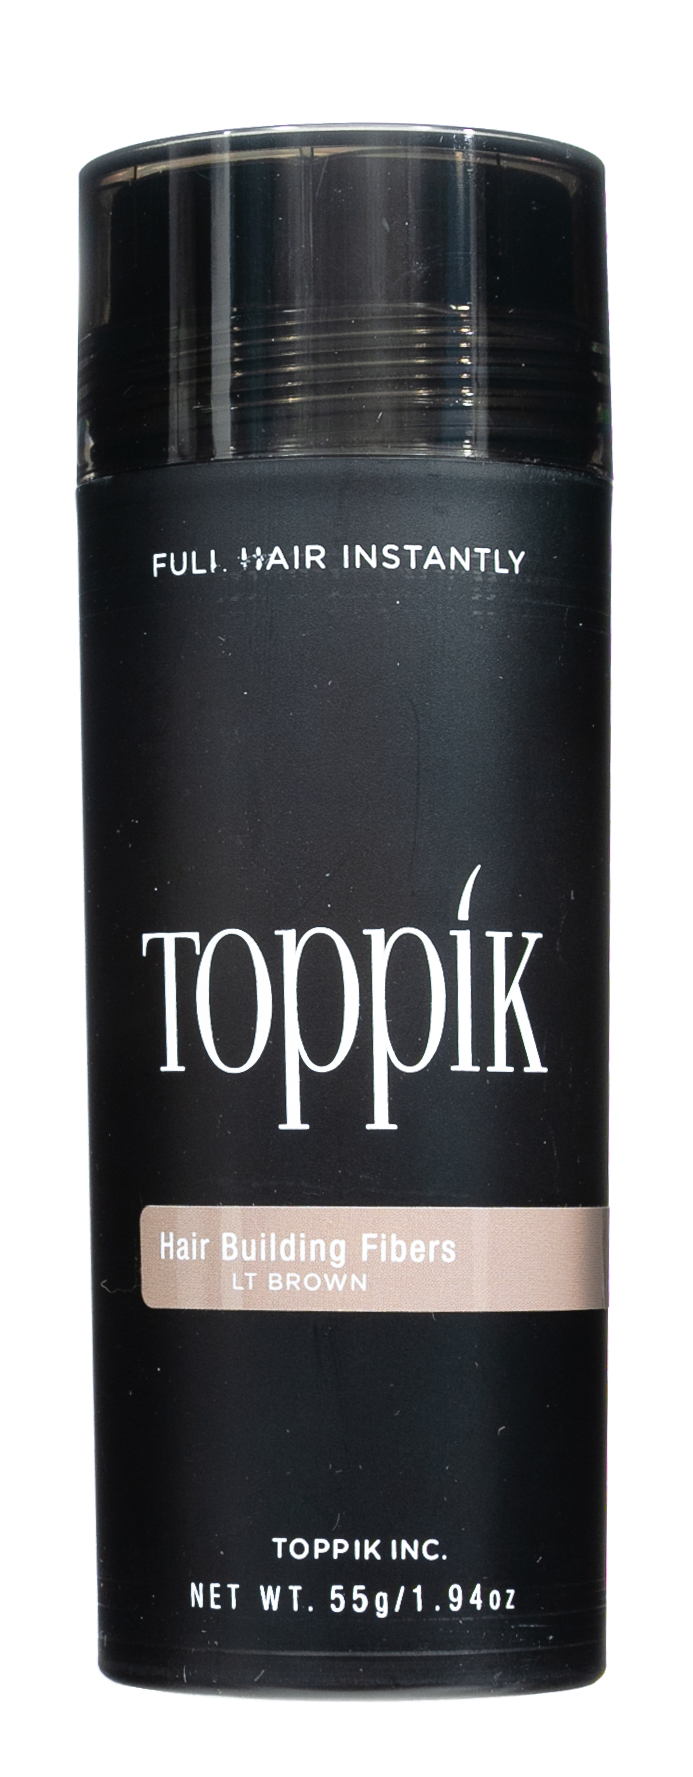 Toppik Пудра-загуститель для волос 27,5 гр (Toppik, Пудры загустители)